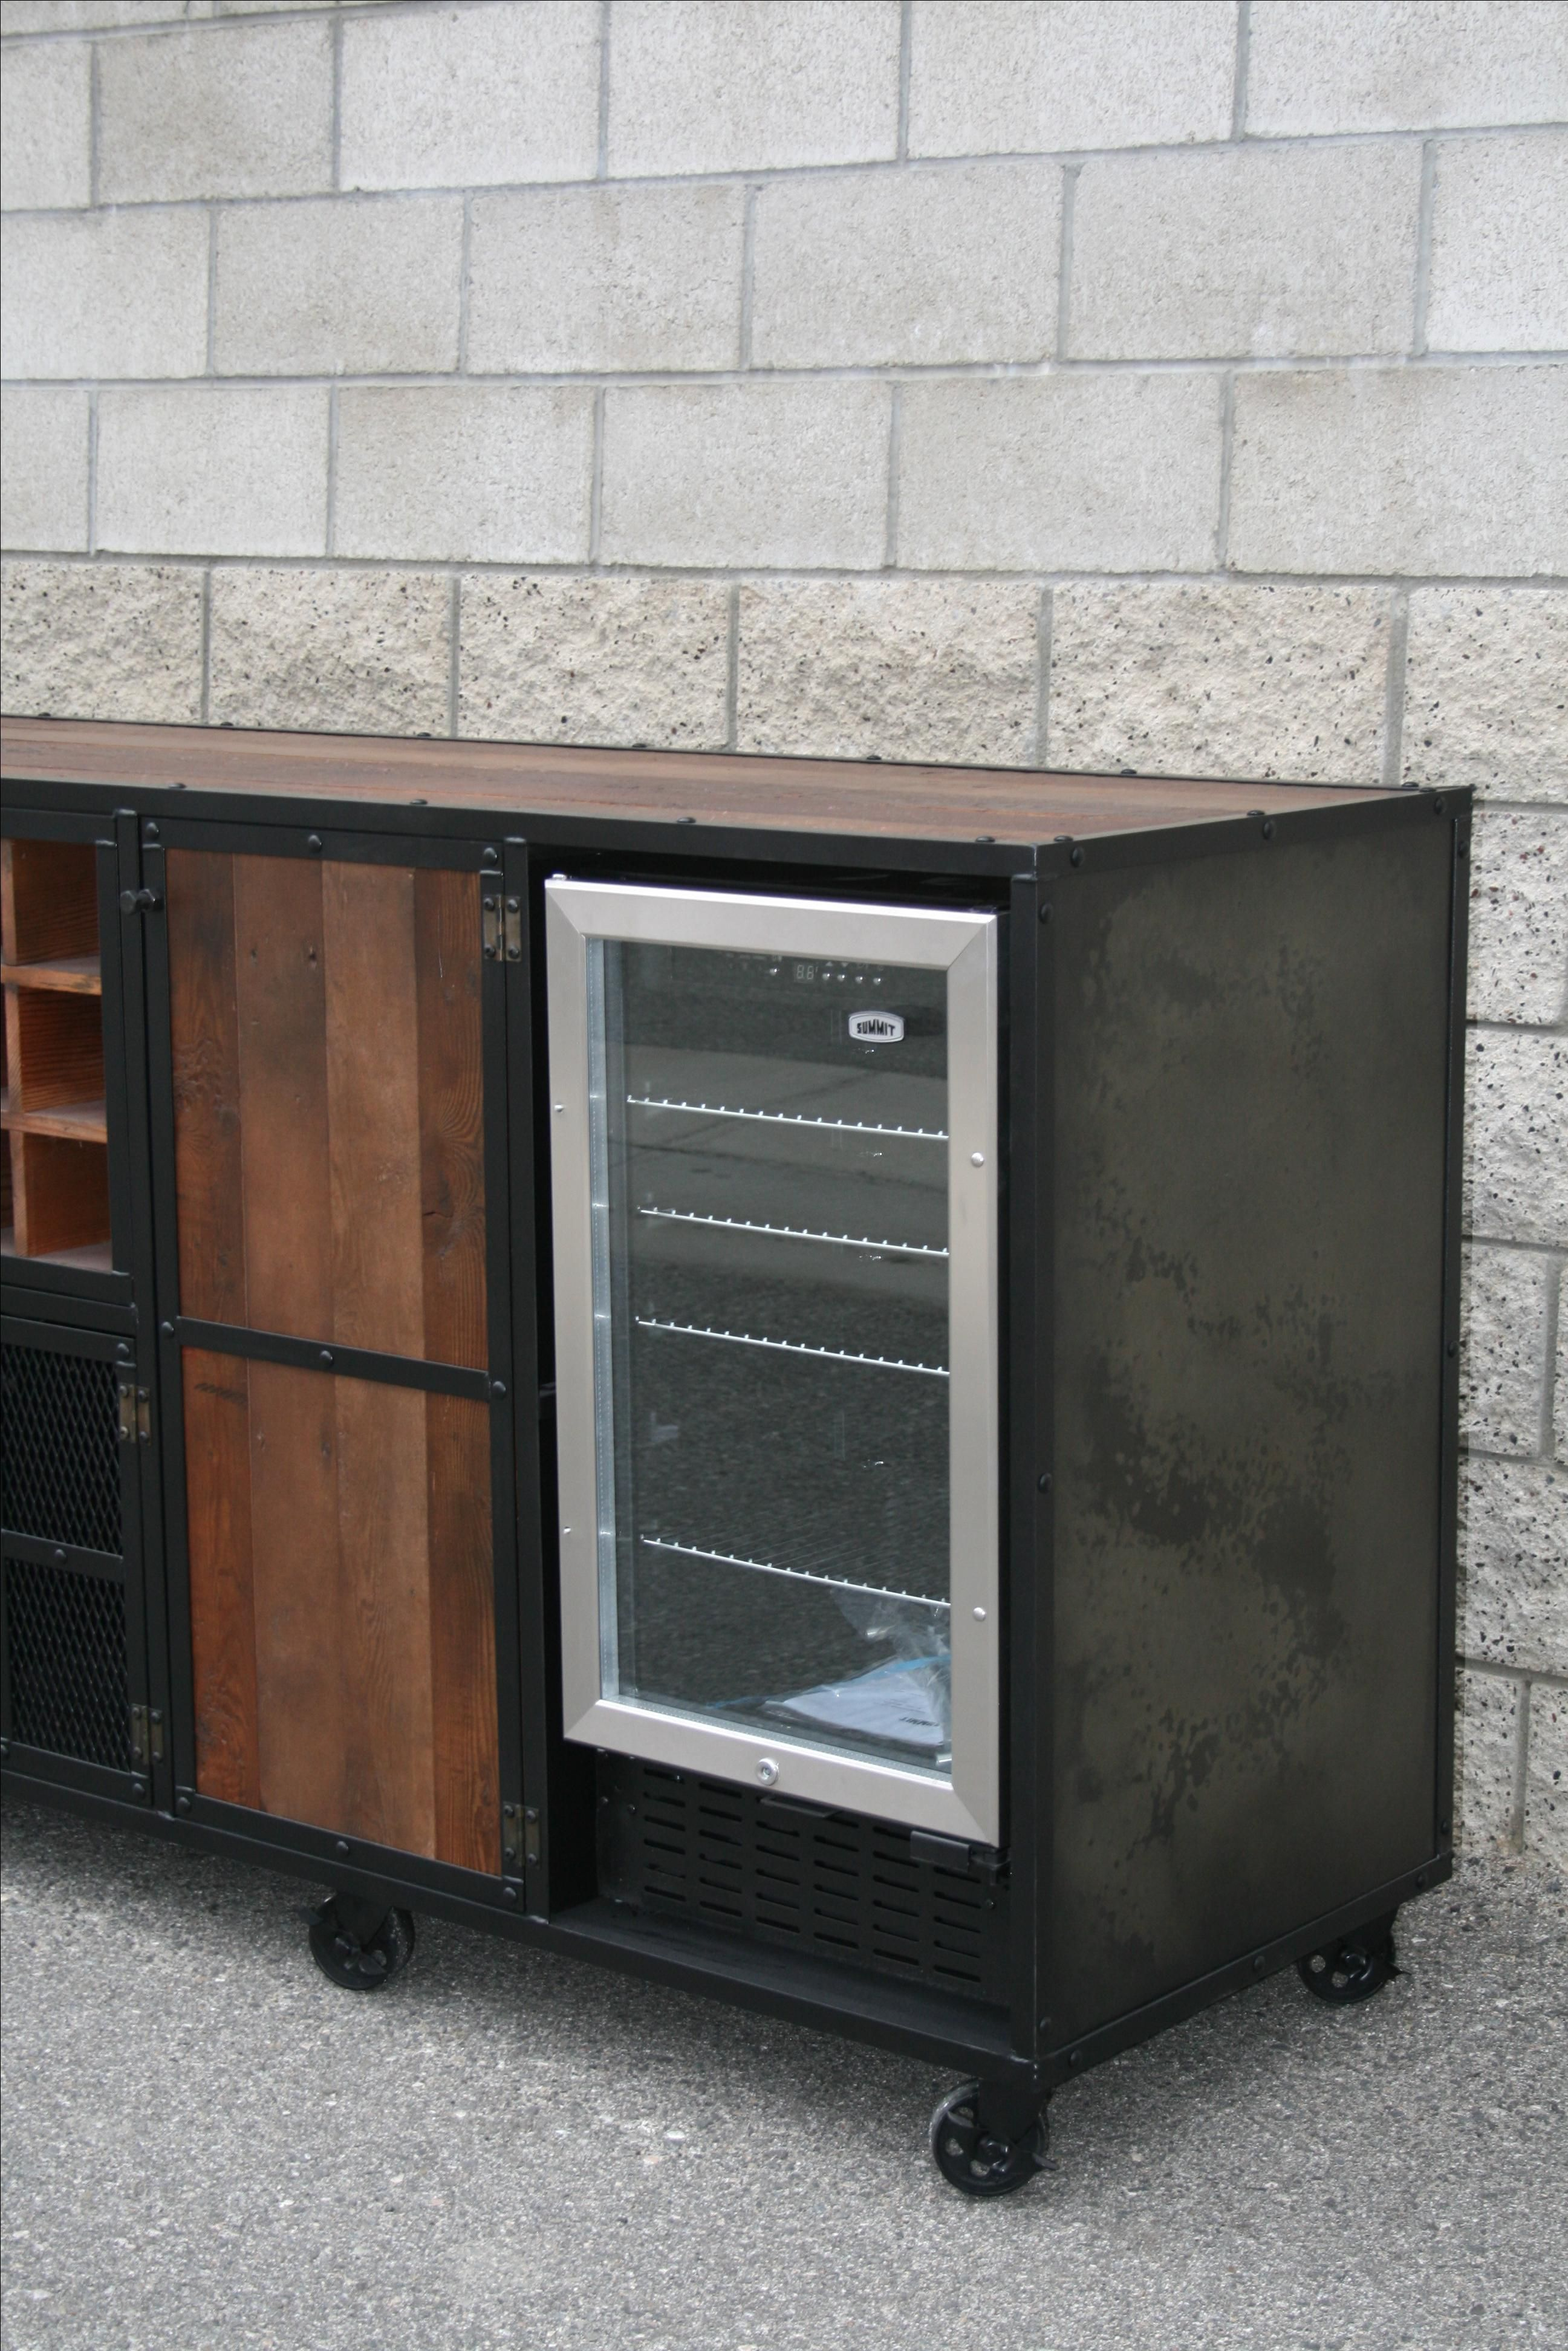 Buy a Handmade Reclaimed Wood Liquor Cabinet Beverage Center Refrigerator Unit Bar Rustic